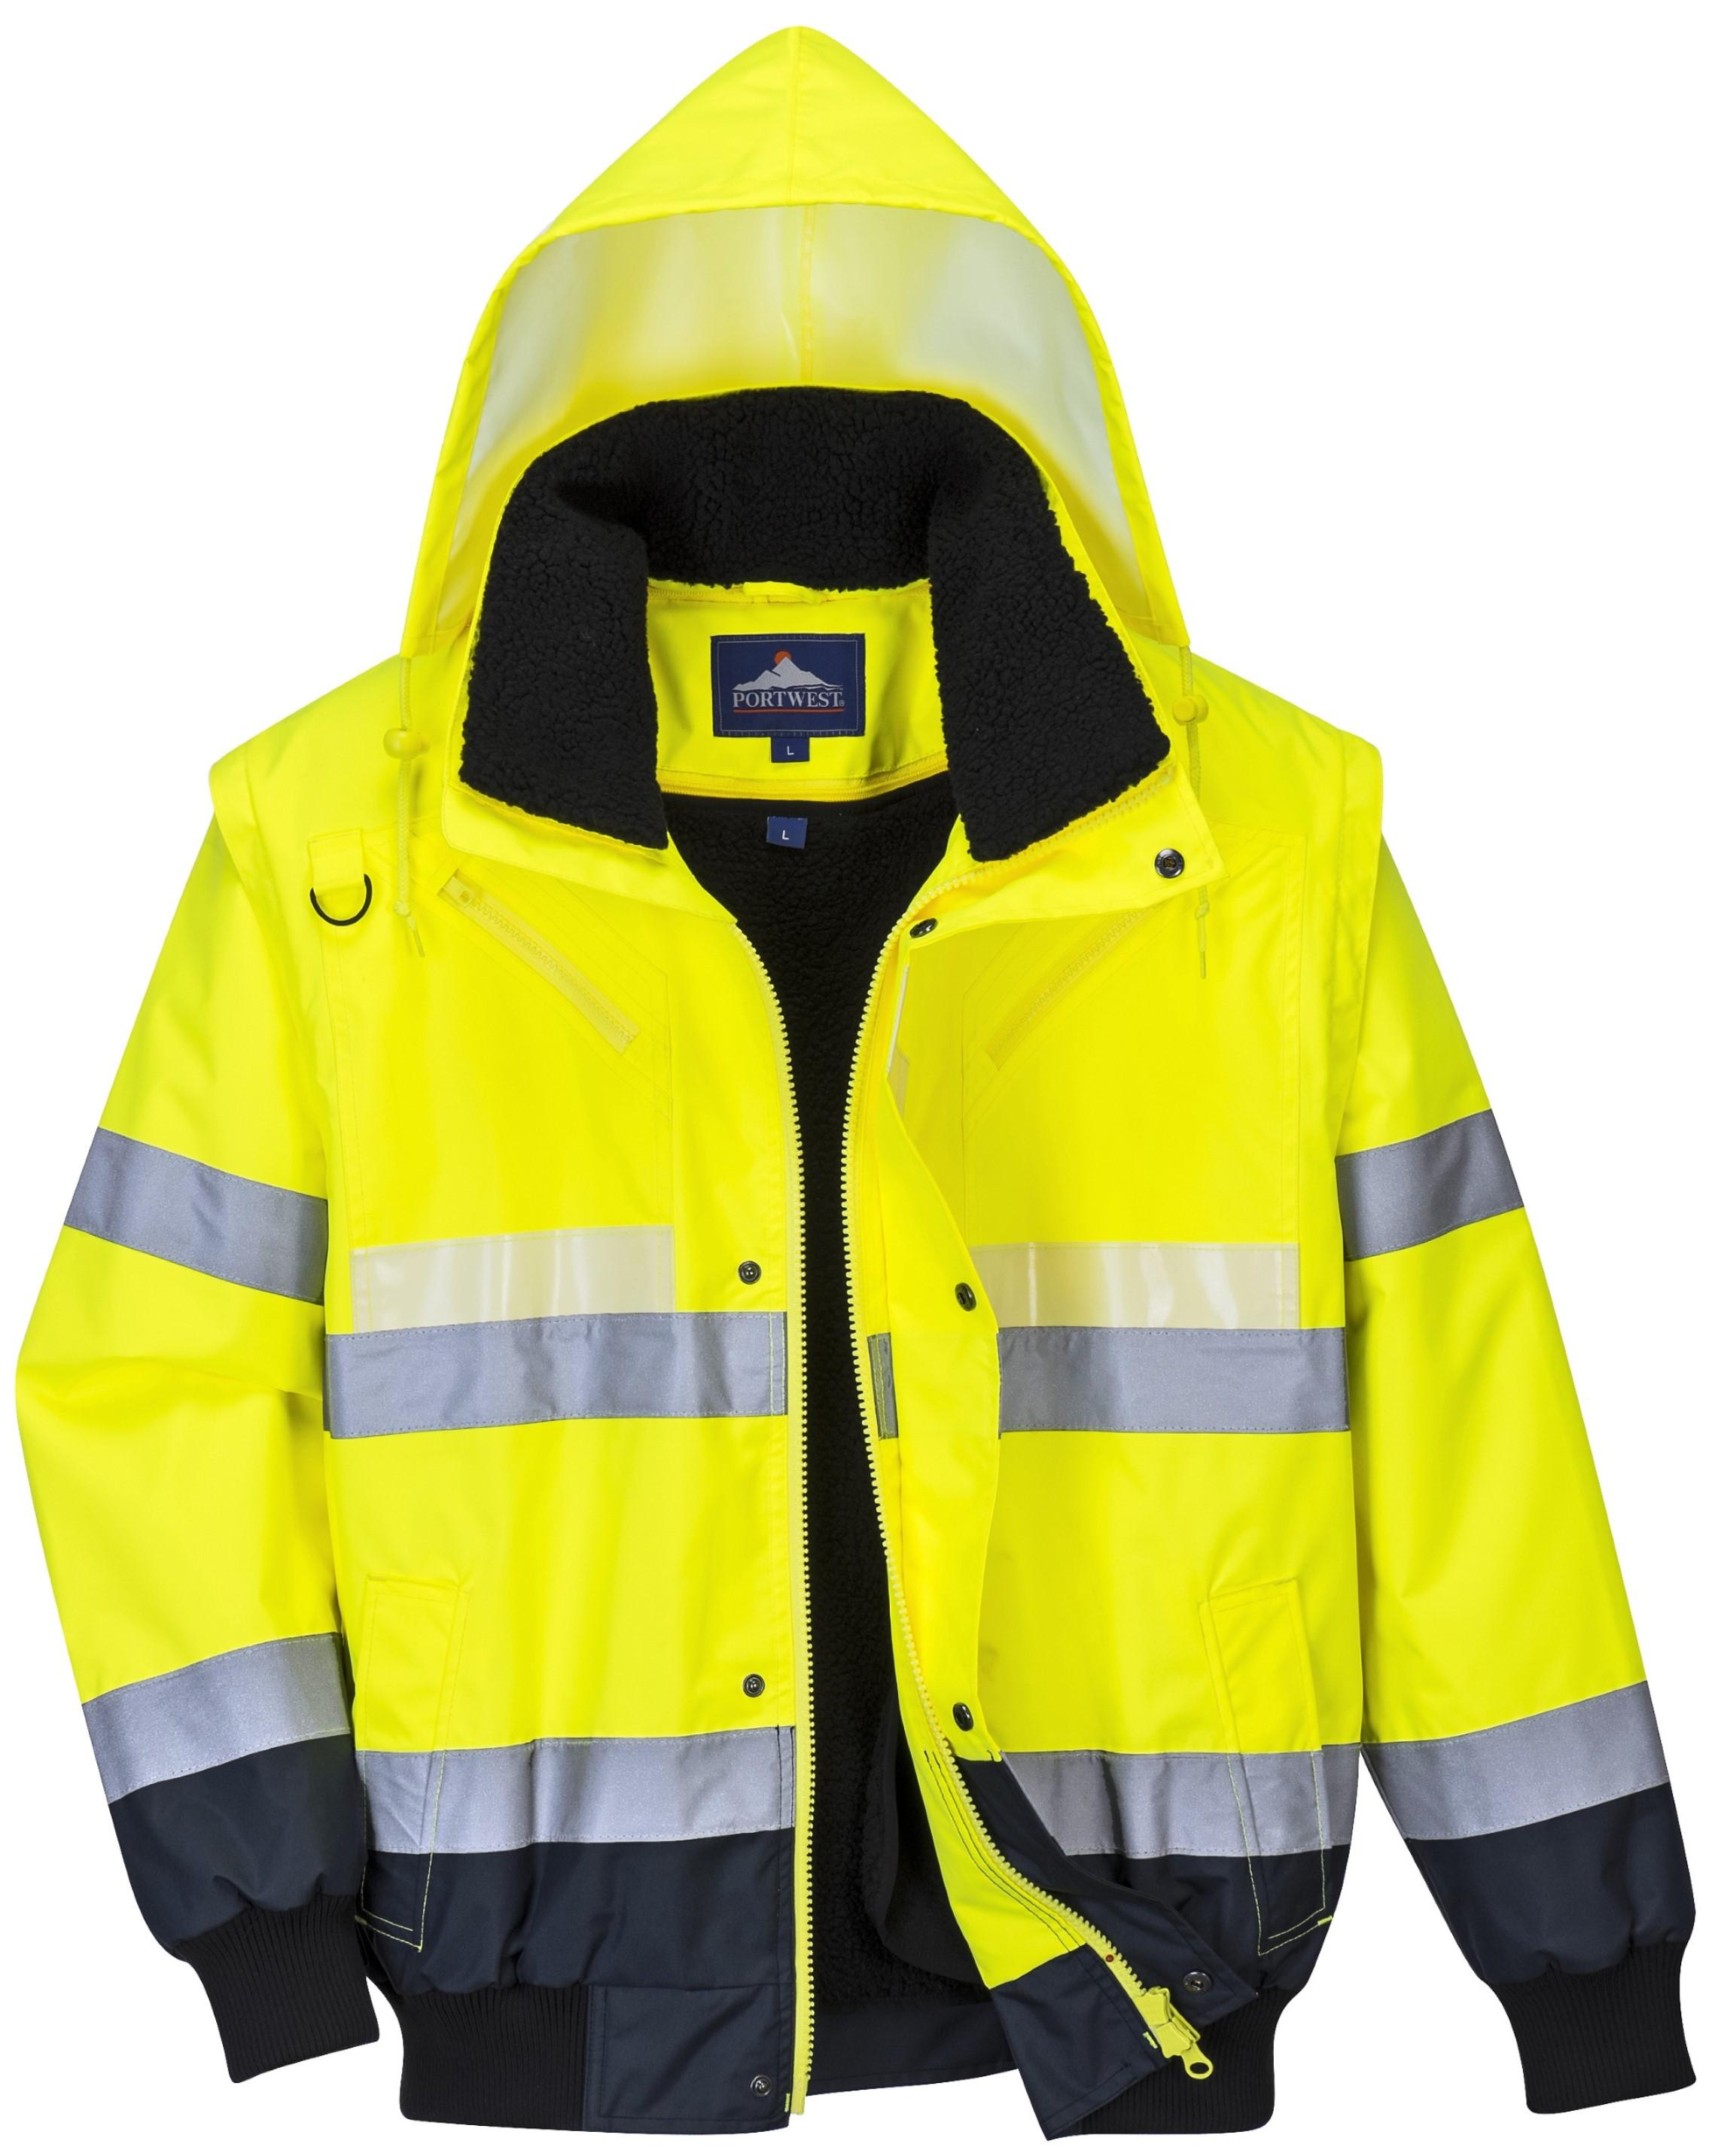 Portwest S460YERXXXL Hi-Vis Traffic Jacket Yellow Regular Size 3X-Large